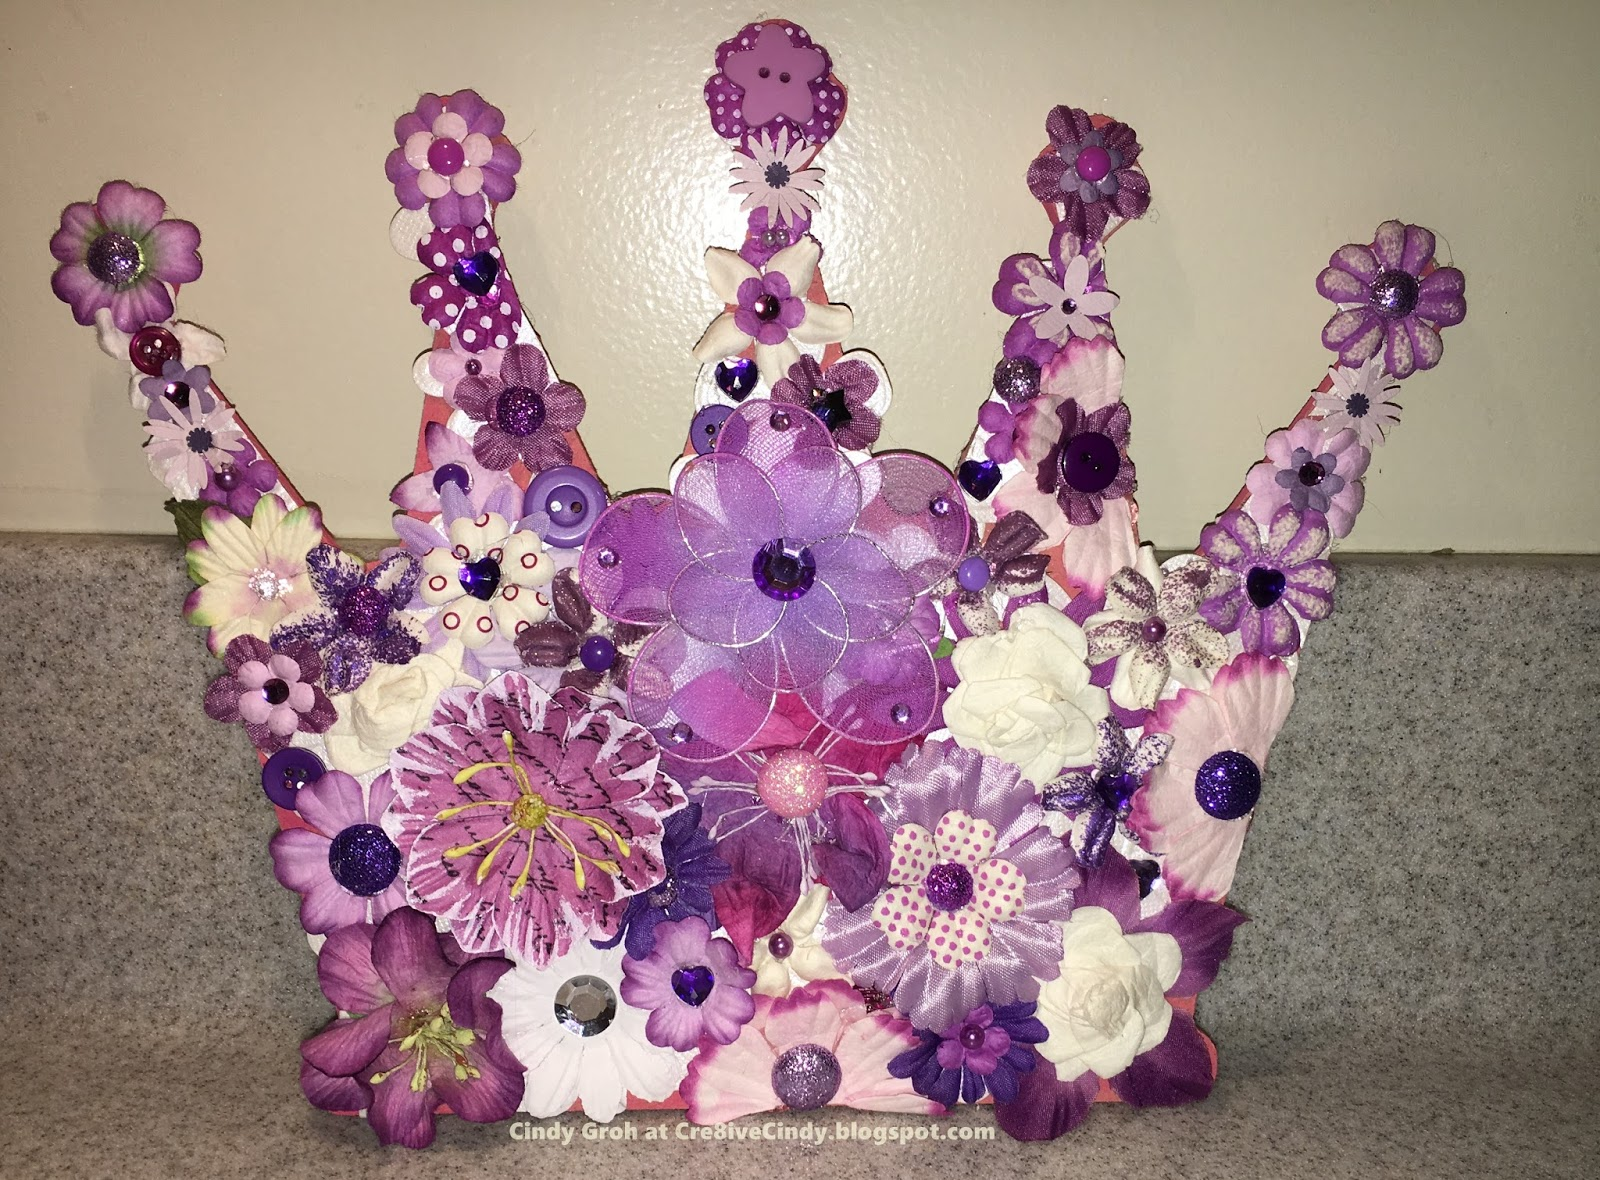 foto de Cre8iveCindy: A Crown for the Purple Queen